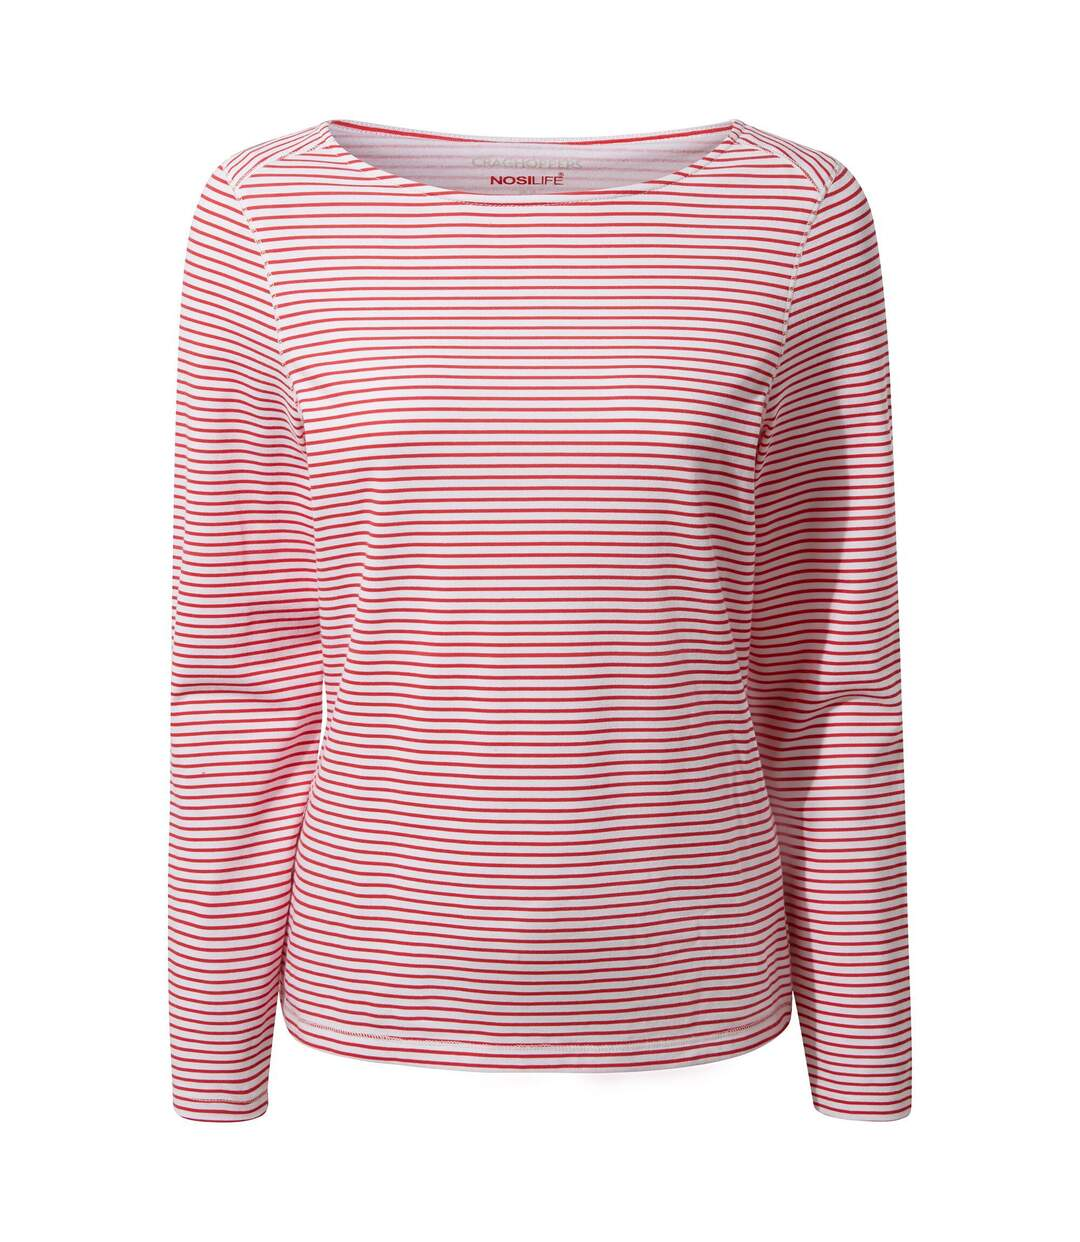 Craghoppers - T-Shirt Manches Longues Erin - Femme (Rouge/blanc) - UTCG1284